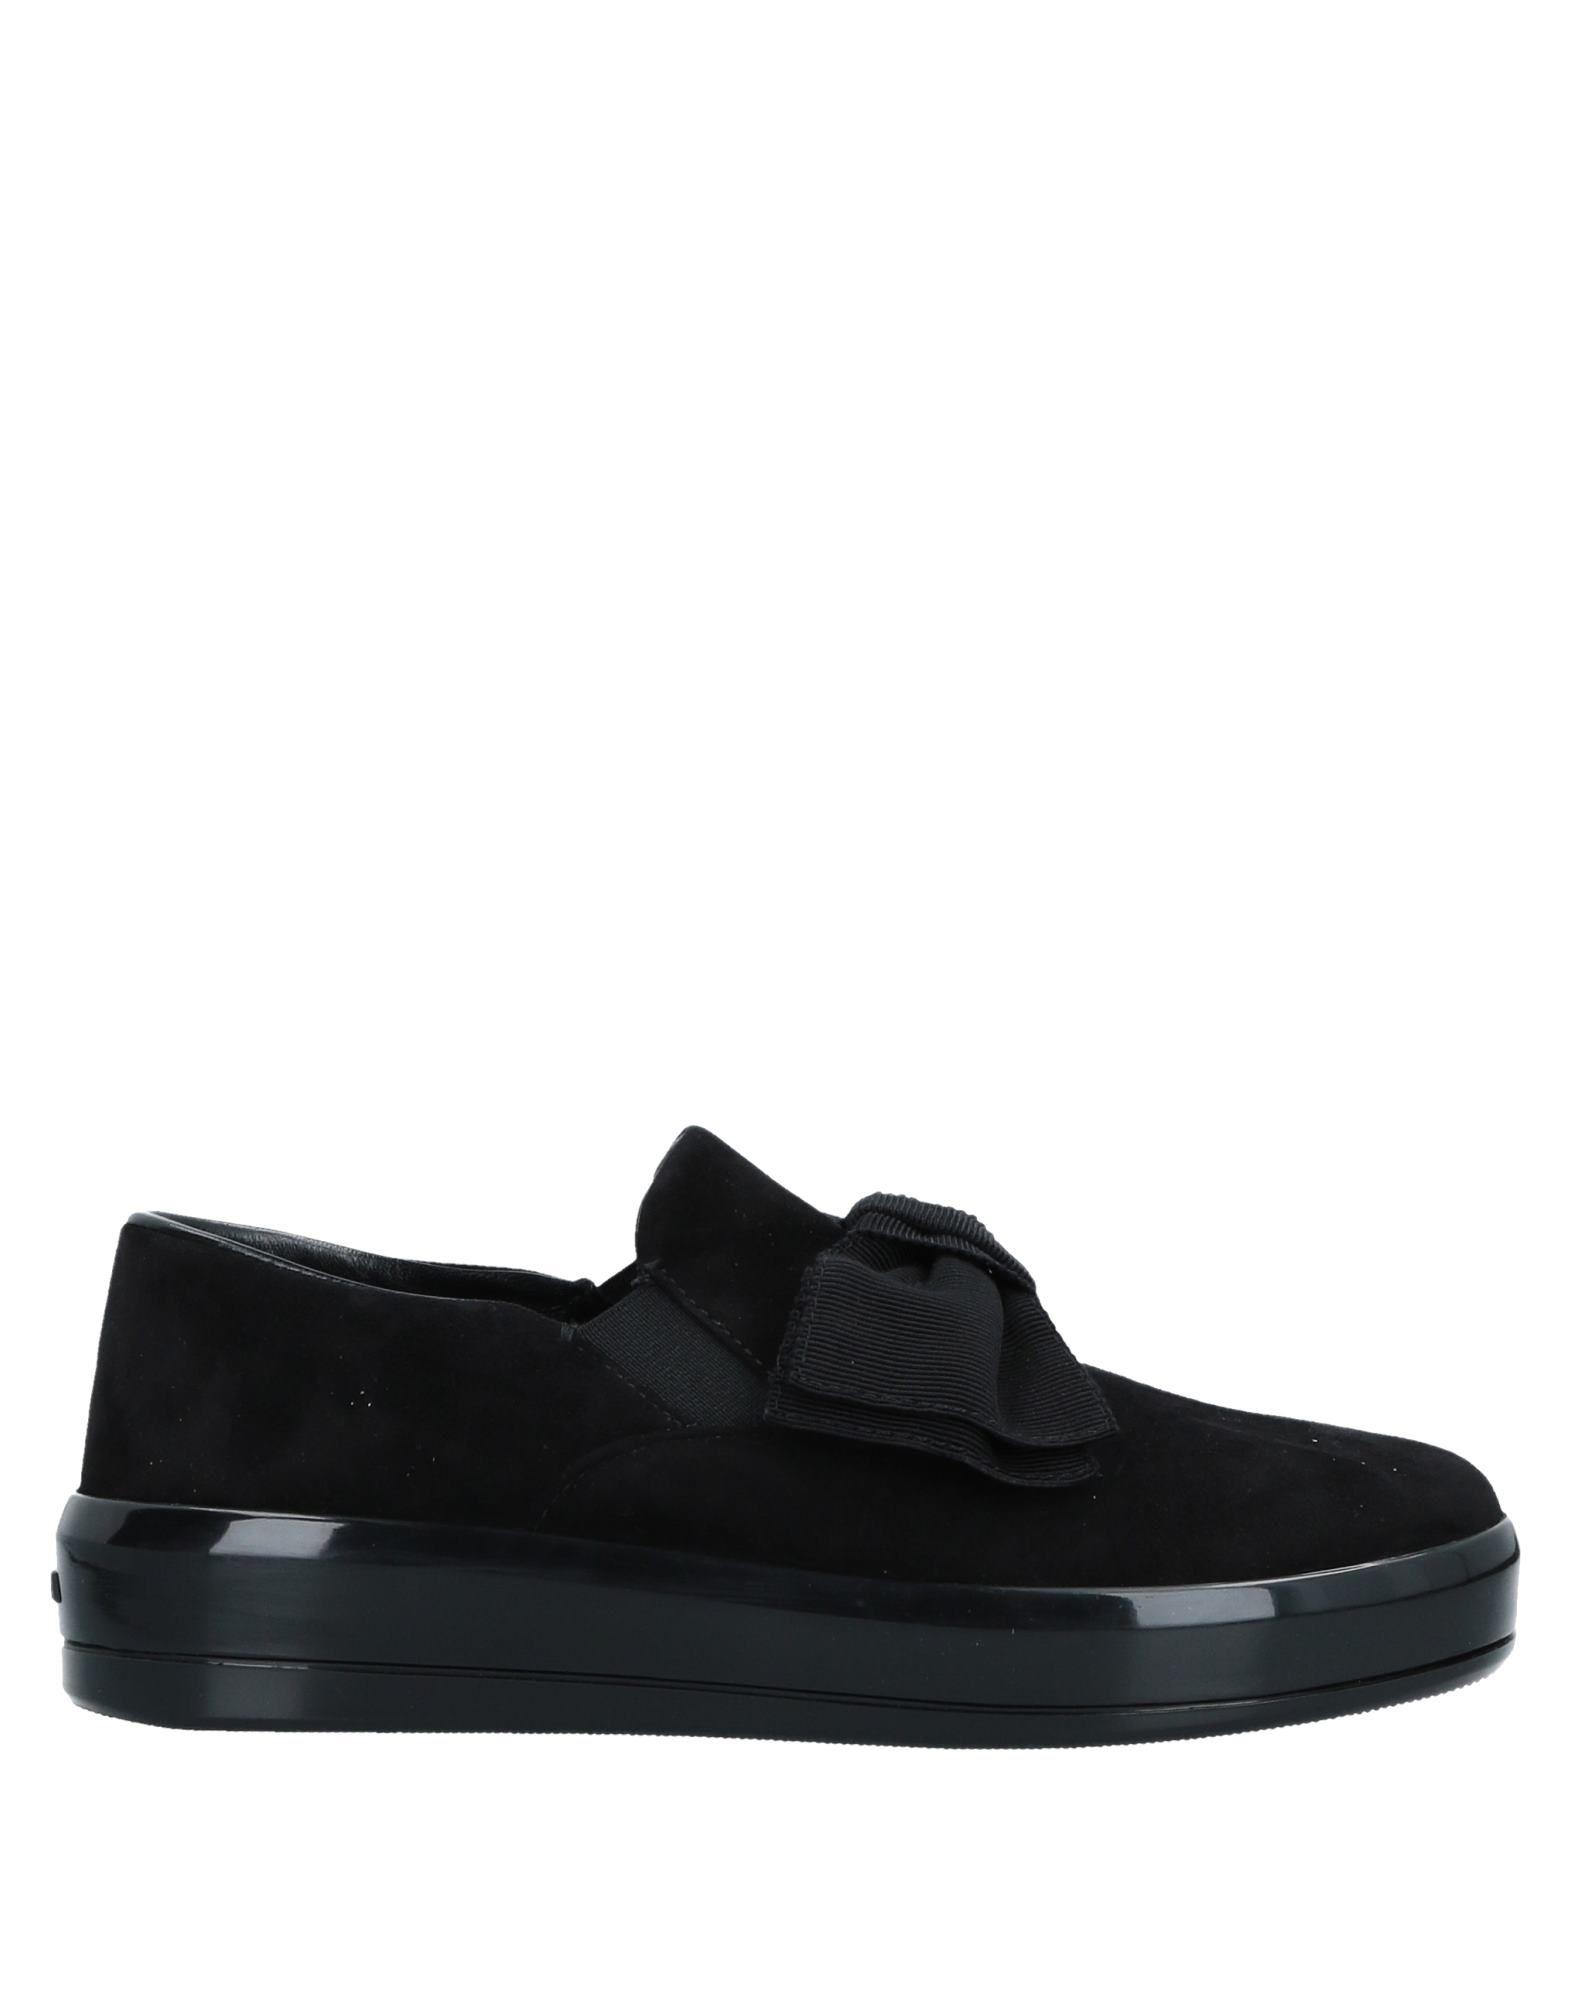 Sneakers Prada Donna e - 11522488NS Scarpe comode e Donna distintive dac4e1